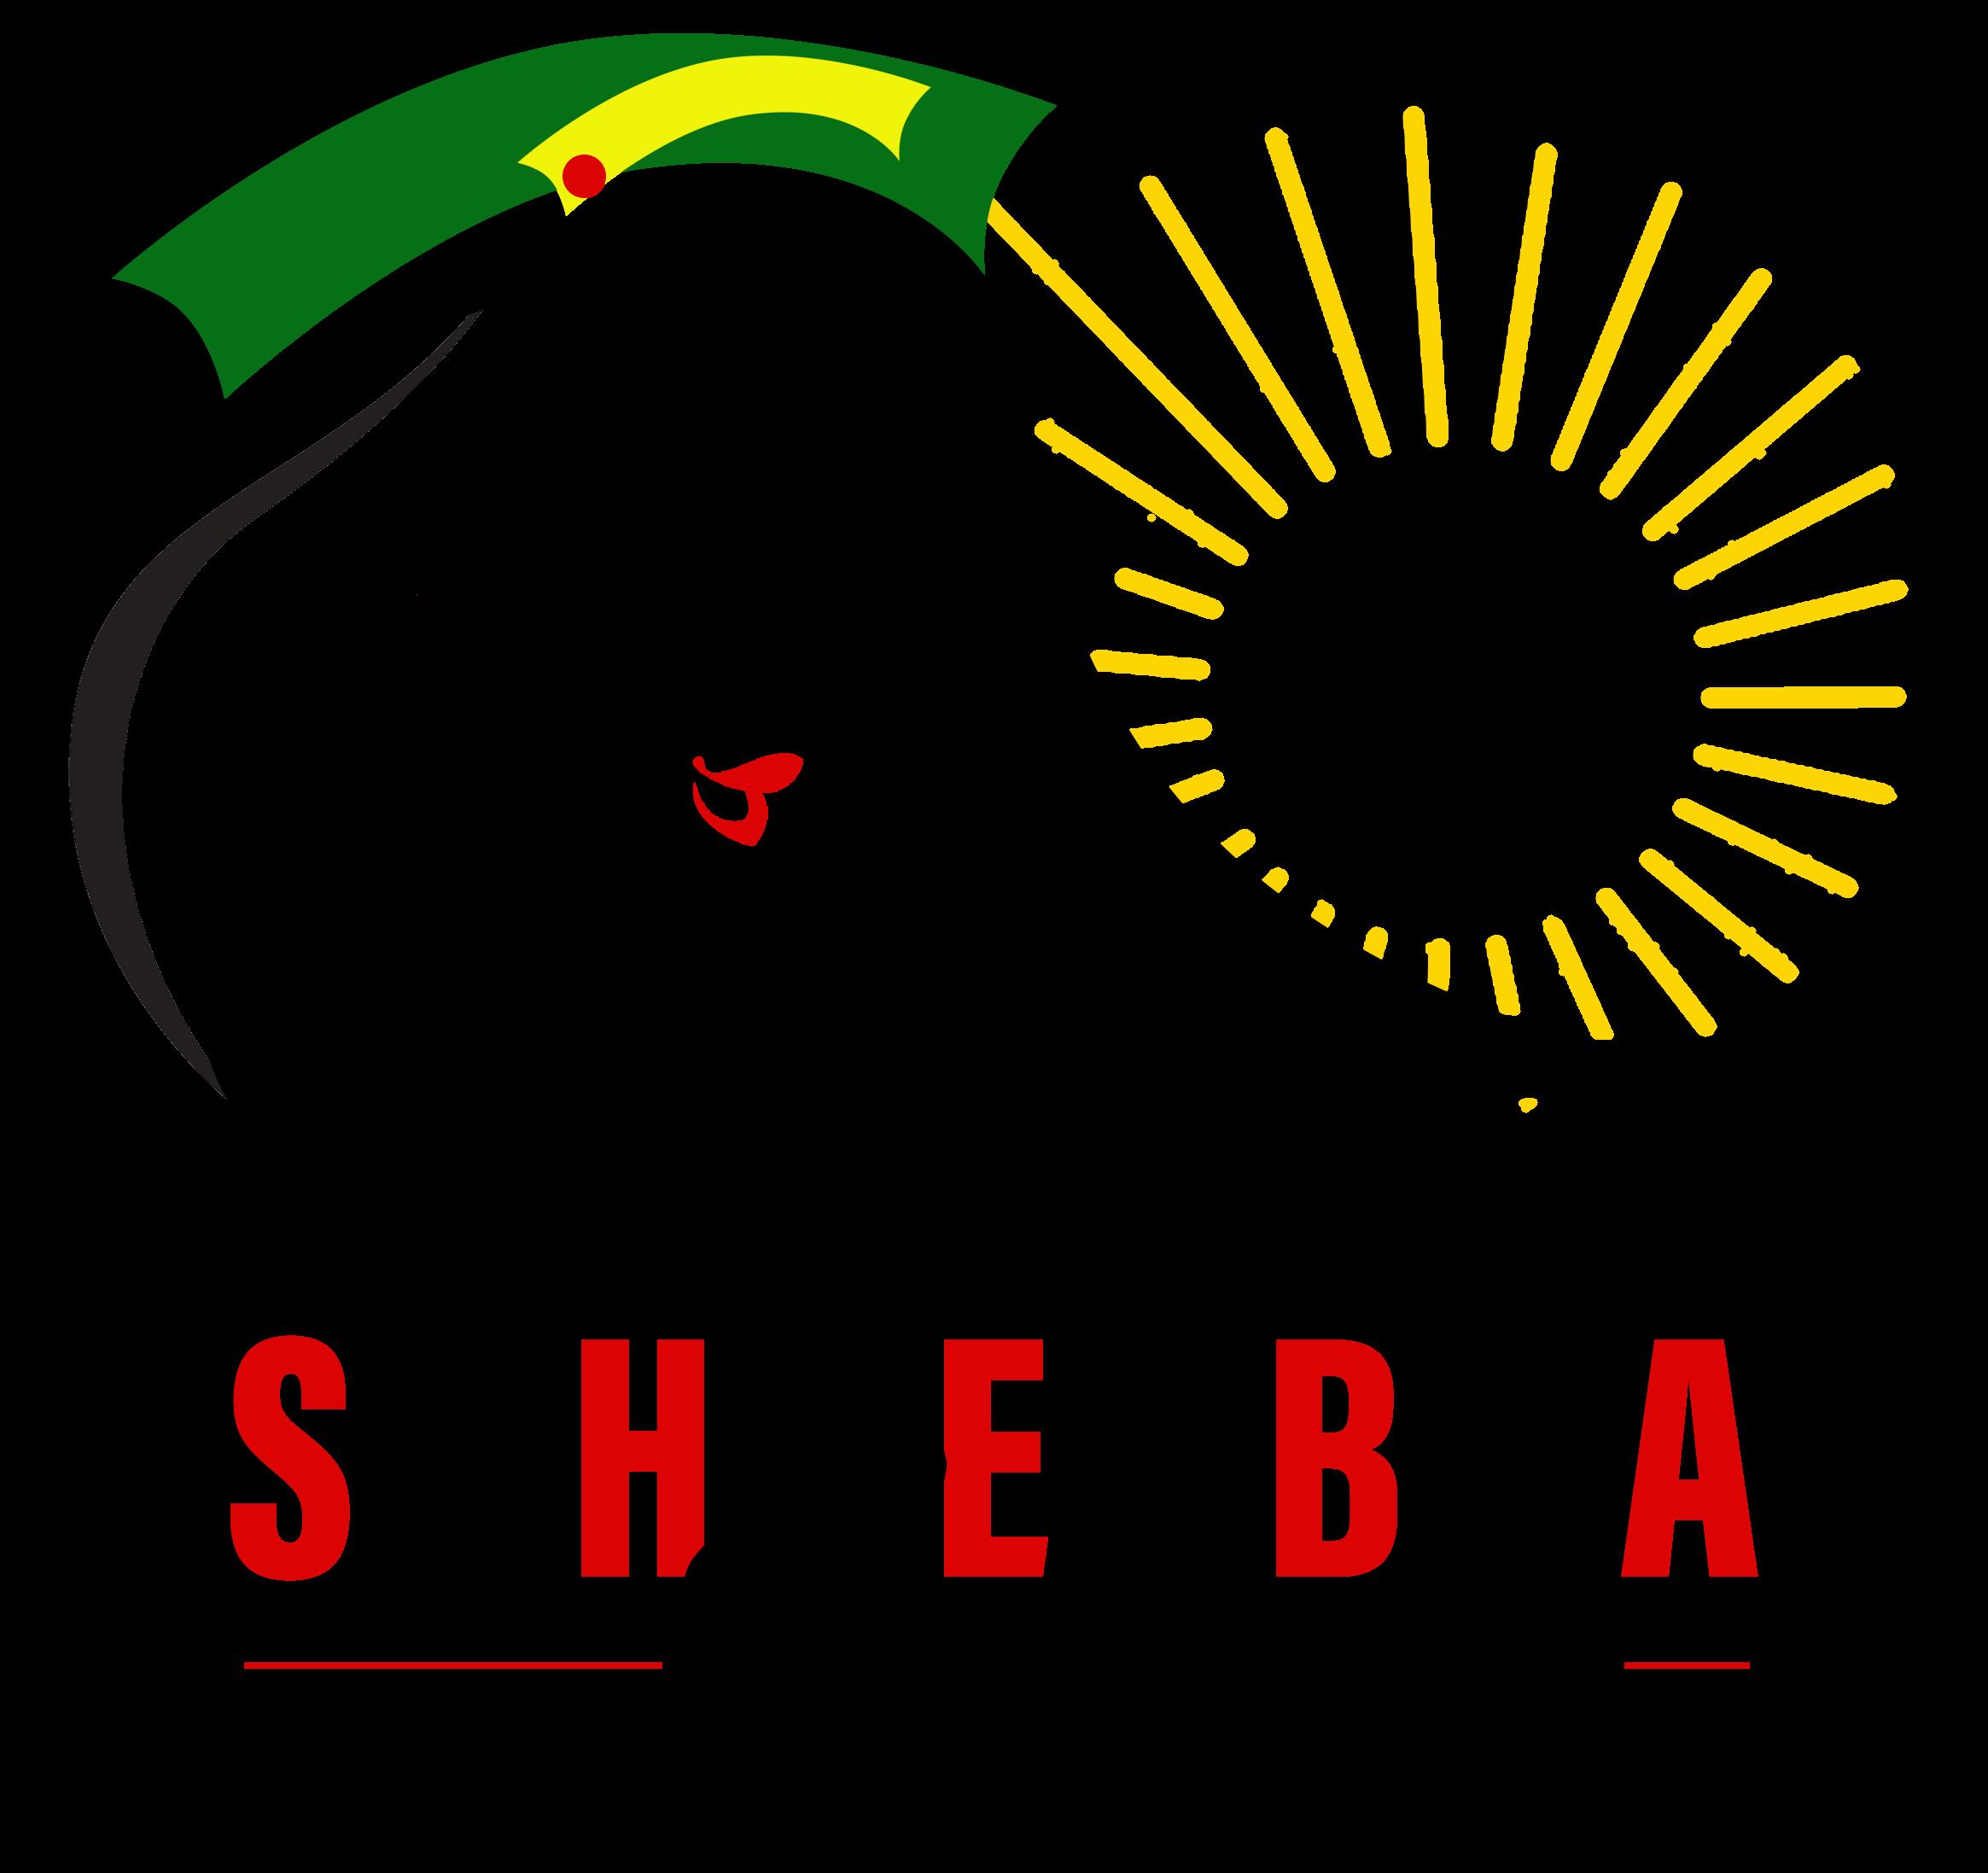 Sheba Empowers